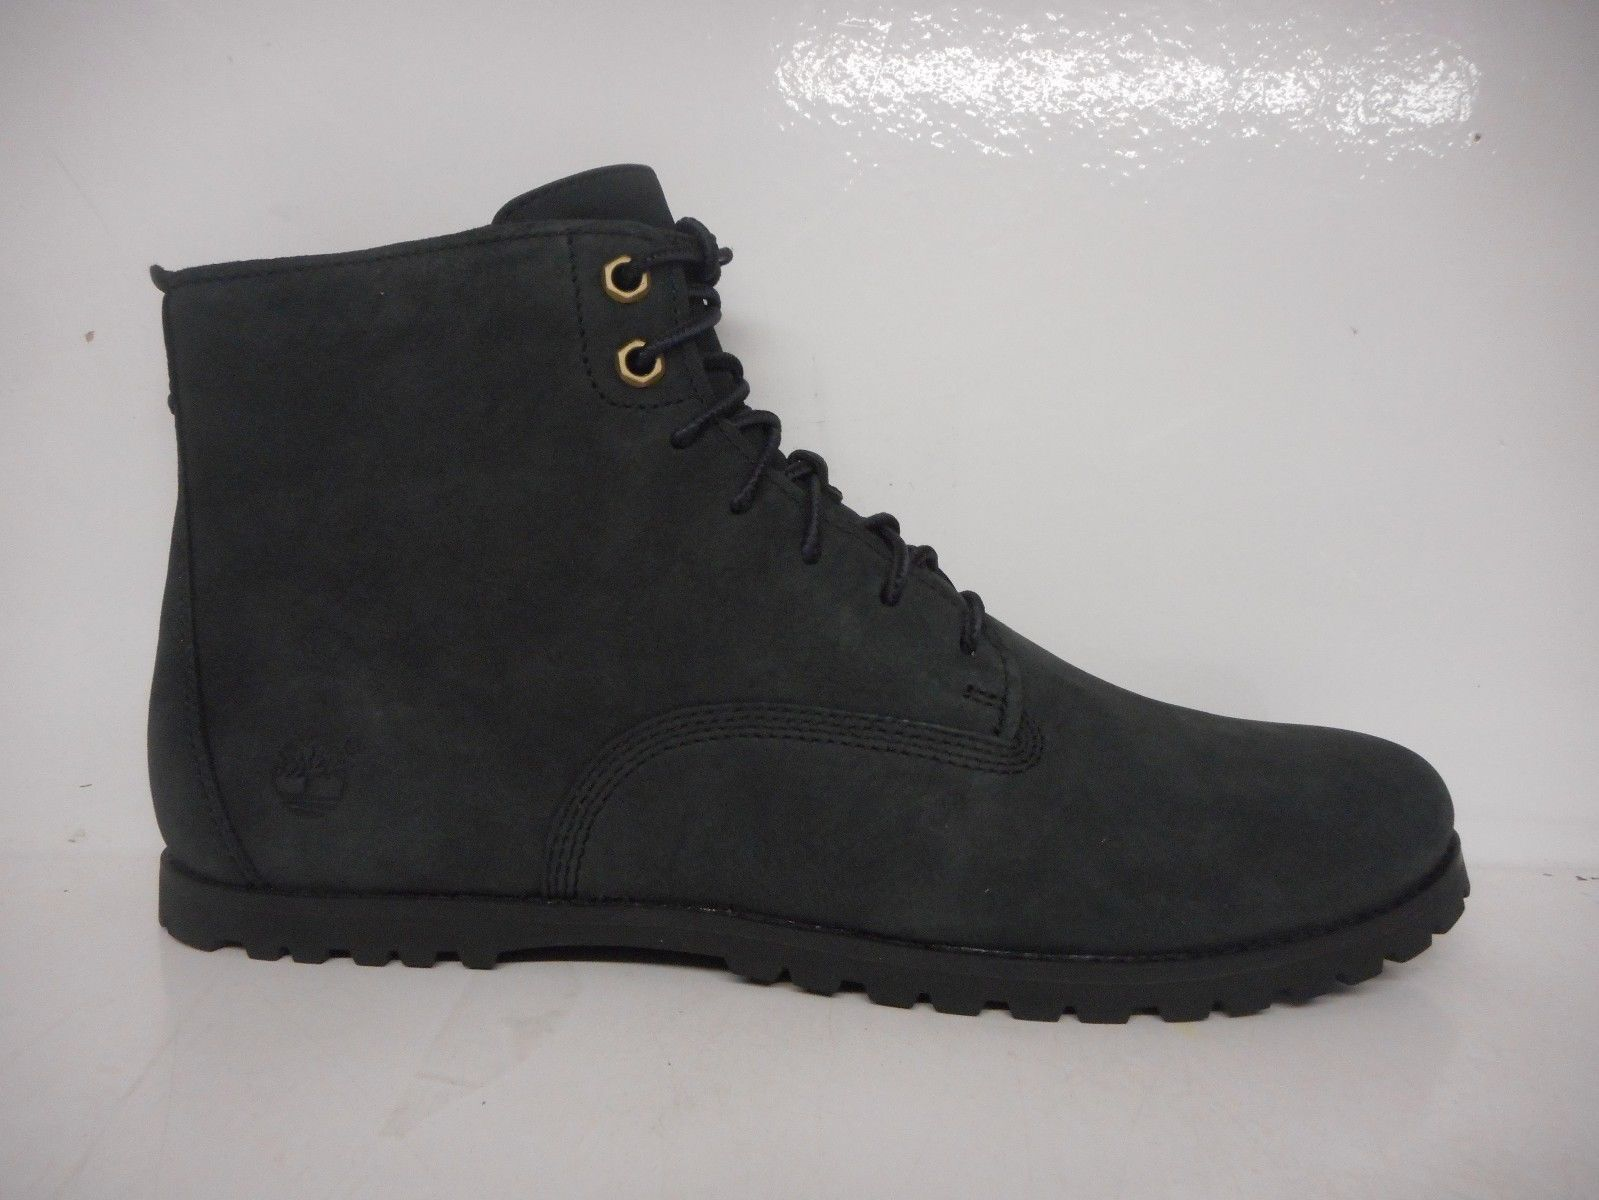 Timberland Women'S Joslin Boots Black A13L2 Select Size